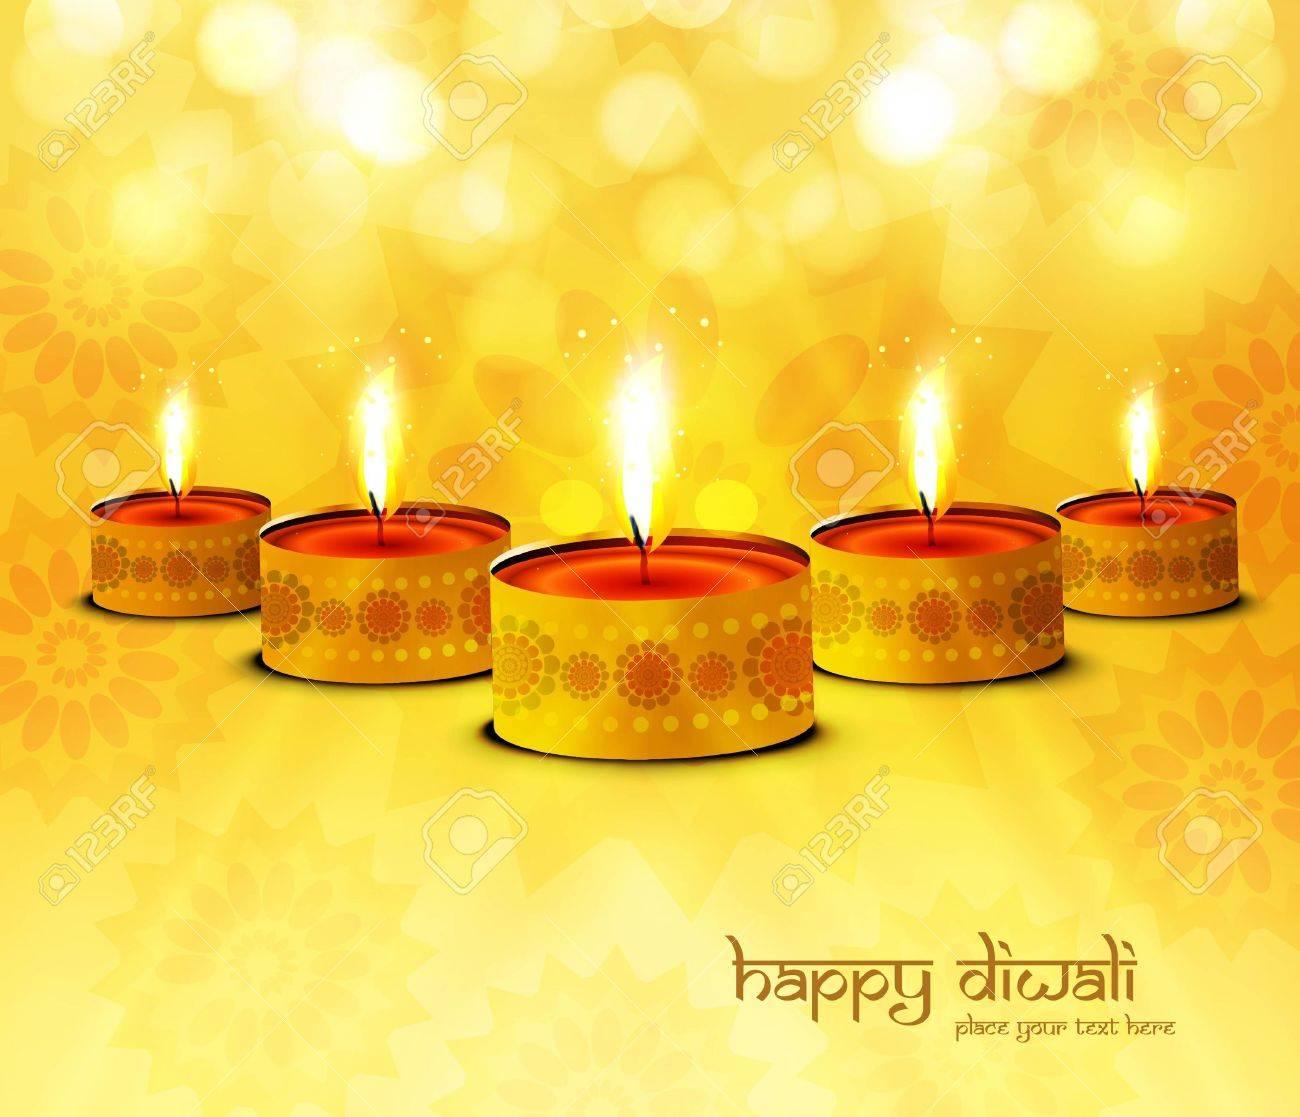 Happy diwali diya celebration bright colorful background Stock Vector - 17945966